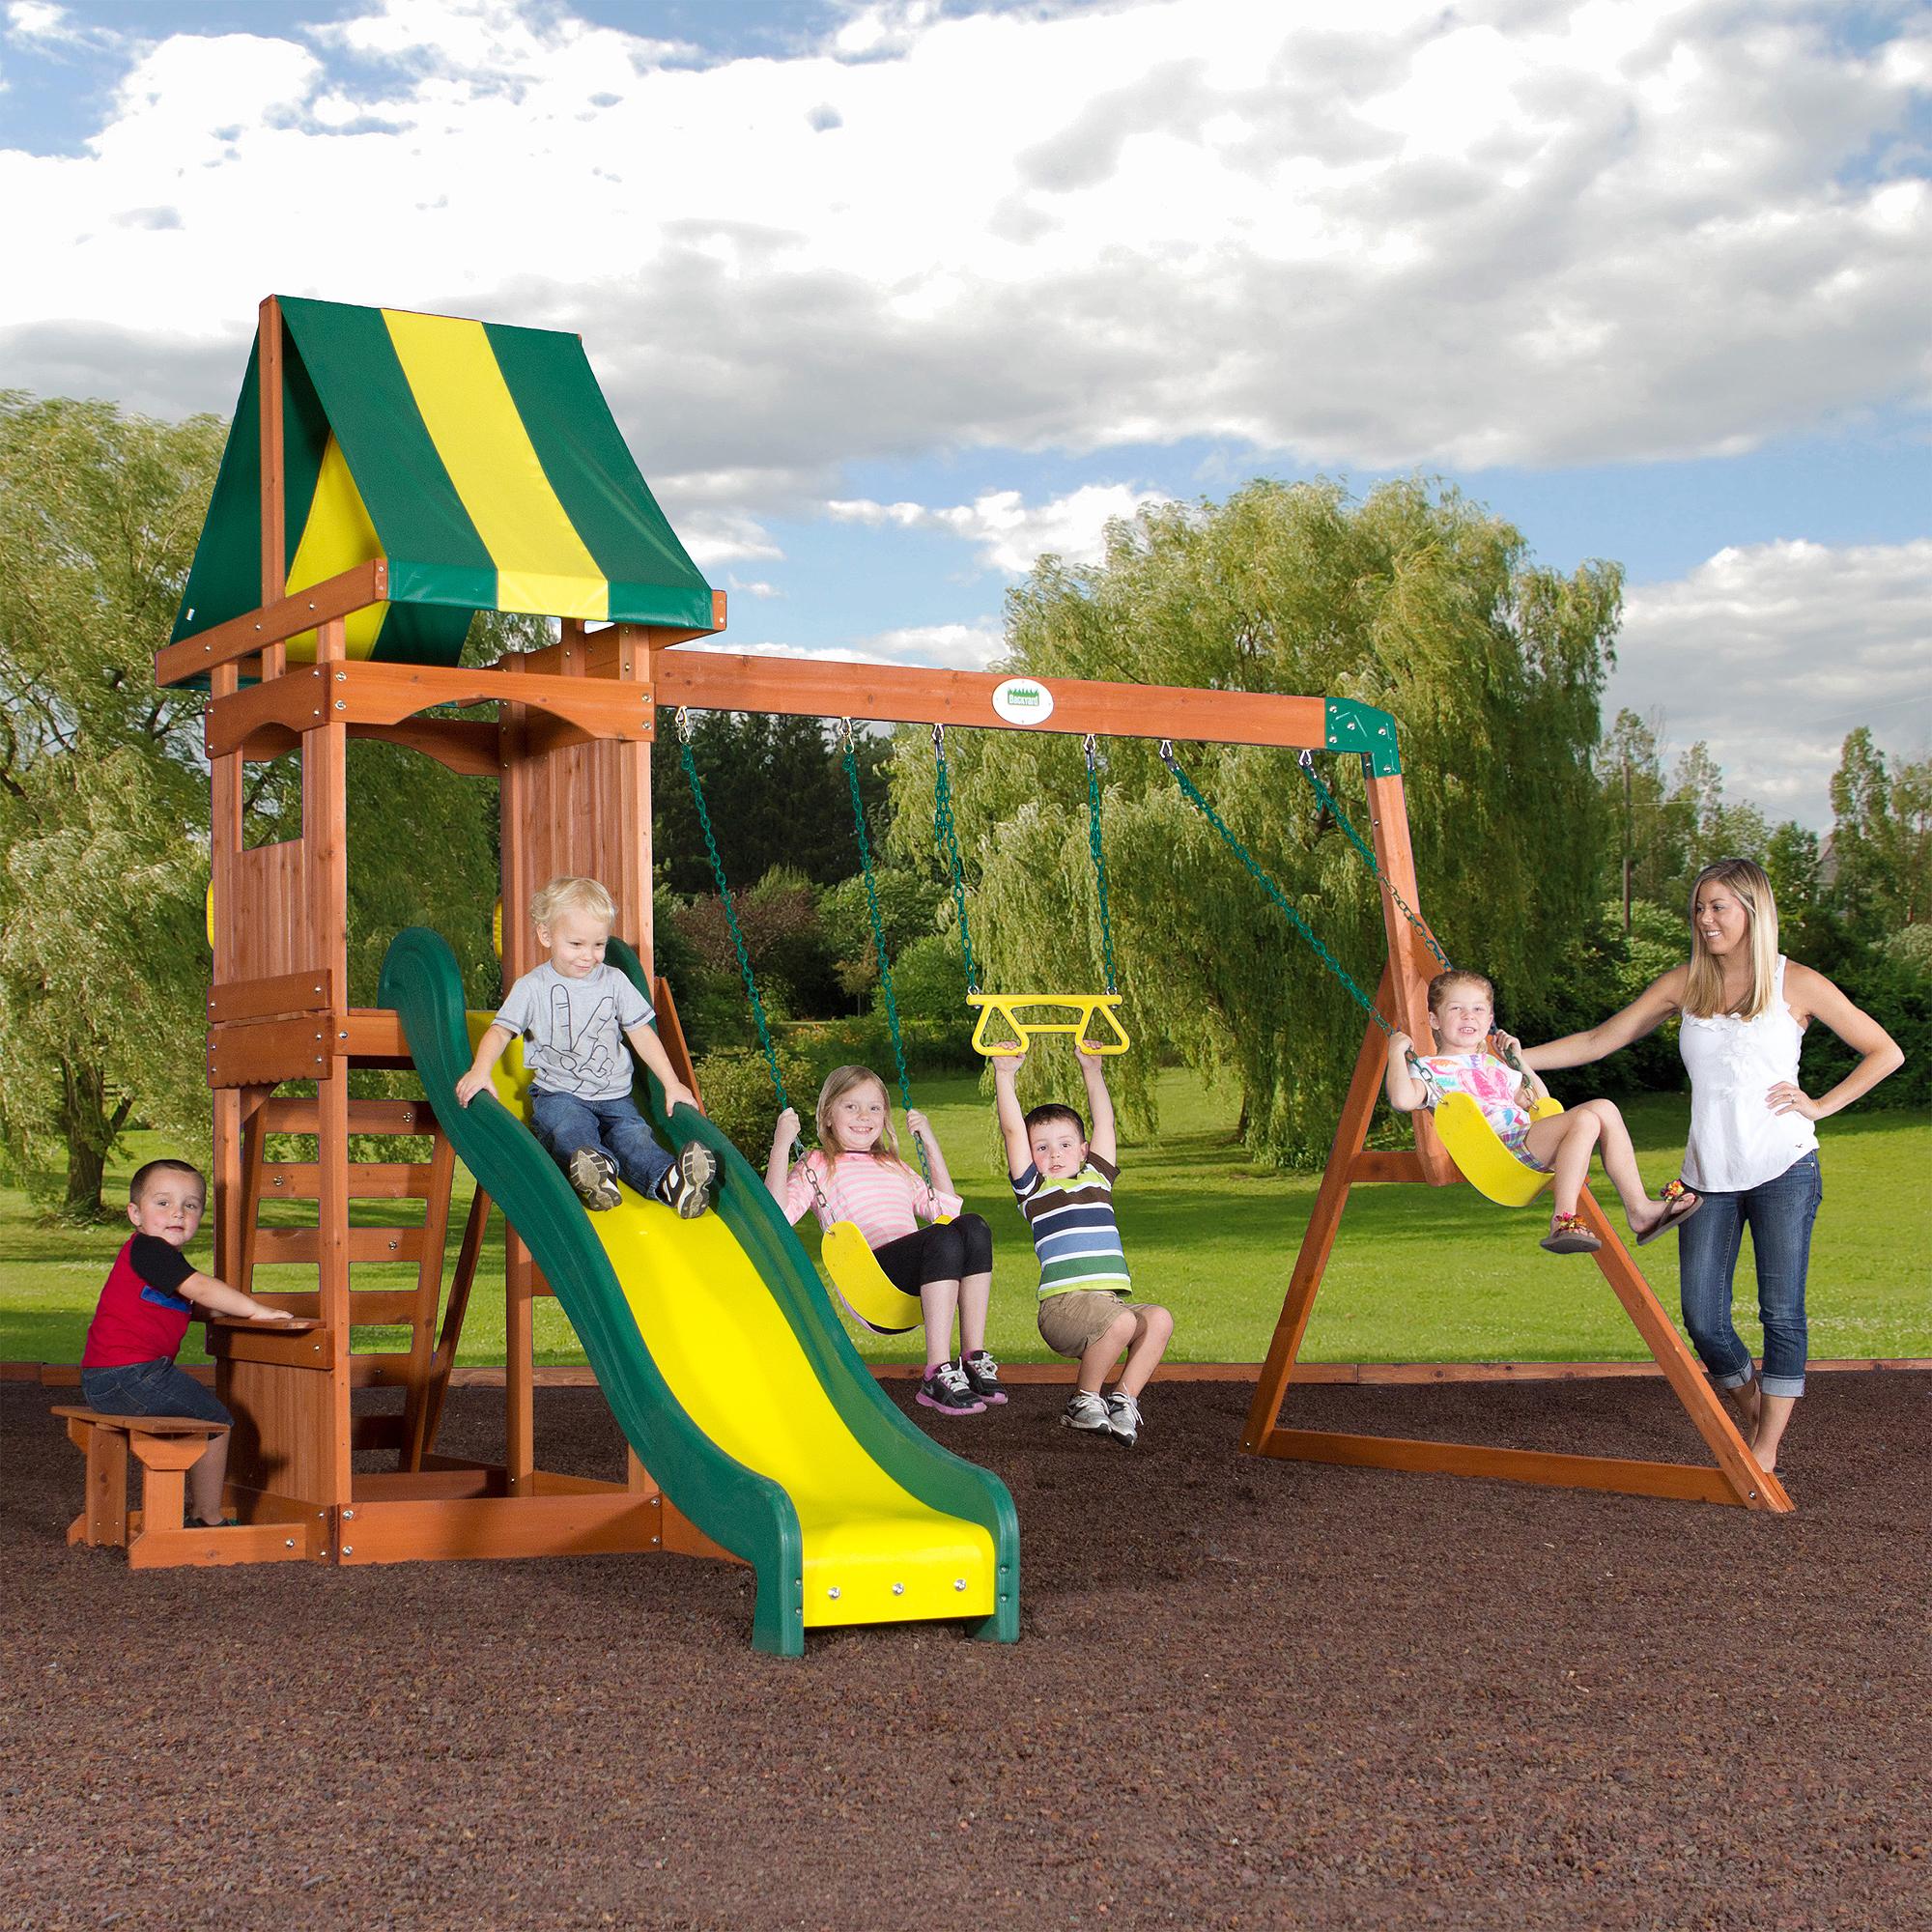 Free Photo Playground Swing Set Playful Playground Recreation